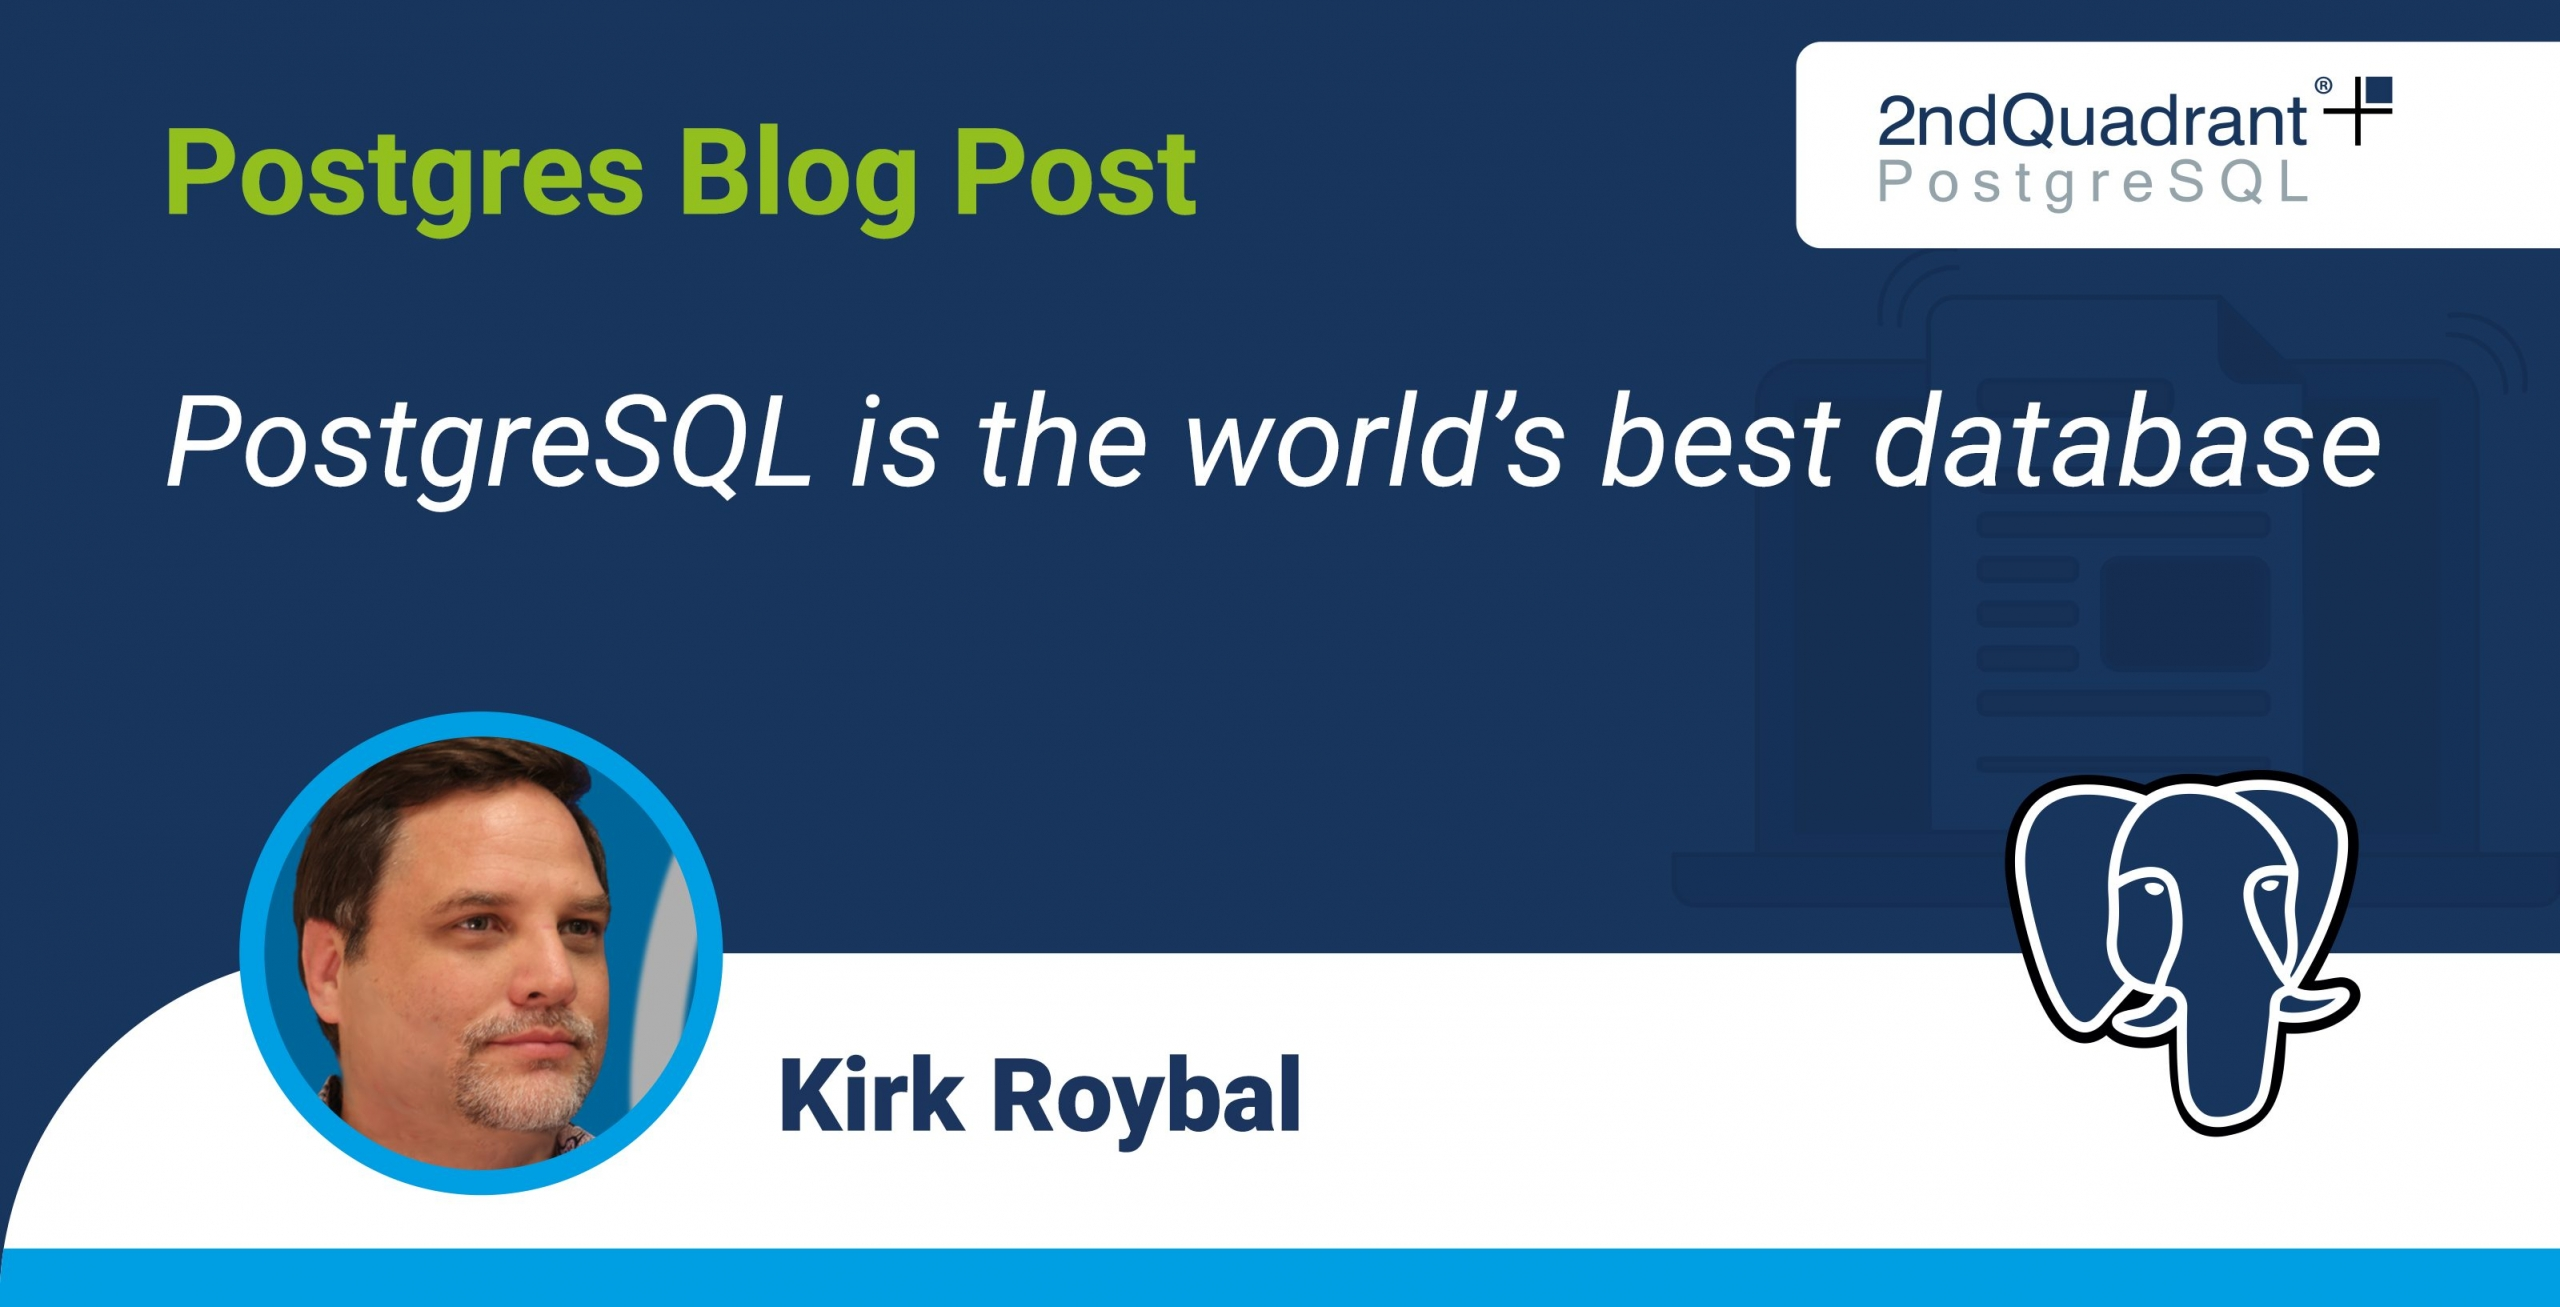 PostgreSQL is the world's best database